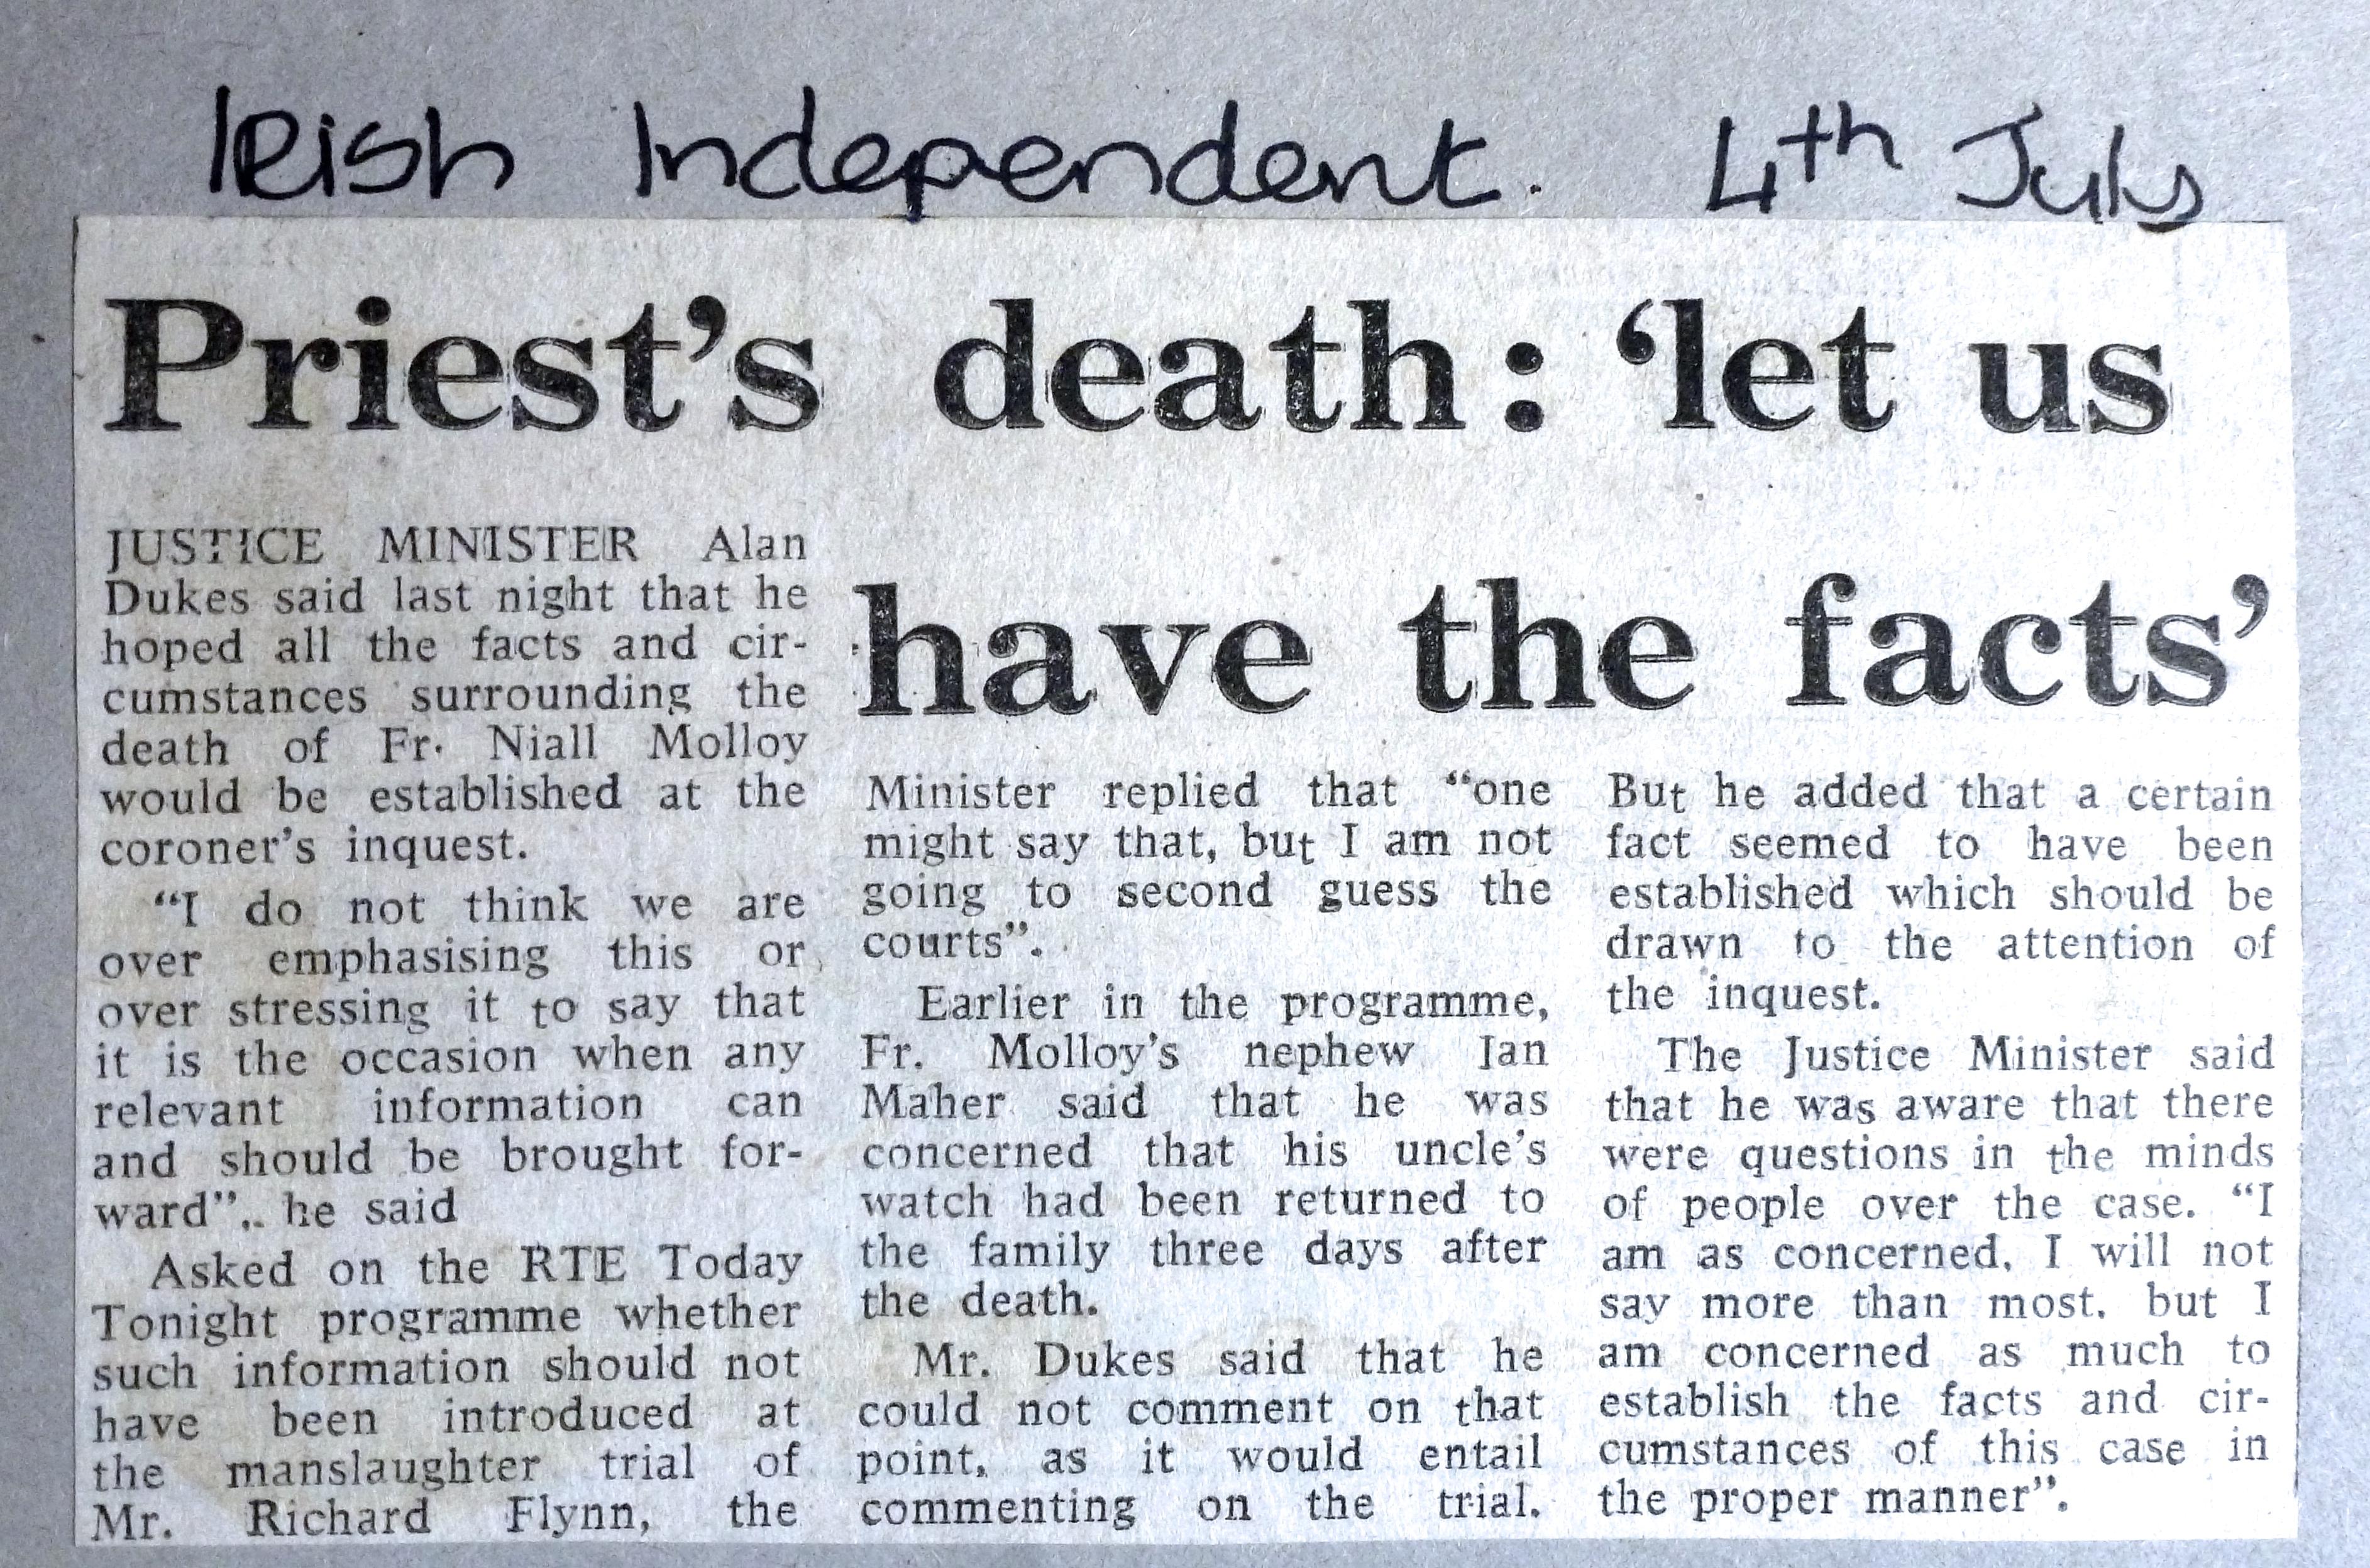 Irish Independent 4th July 1986